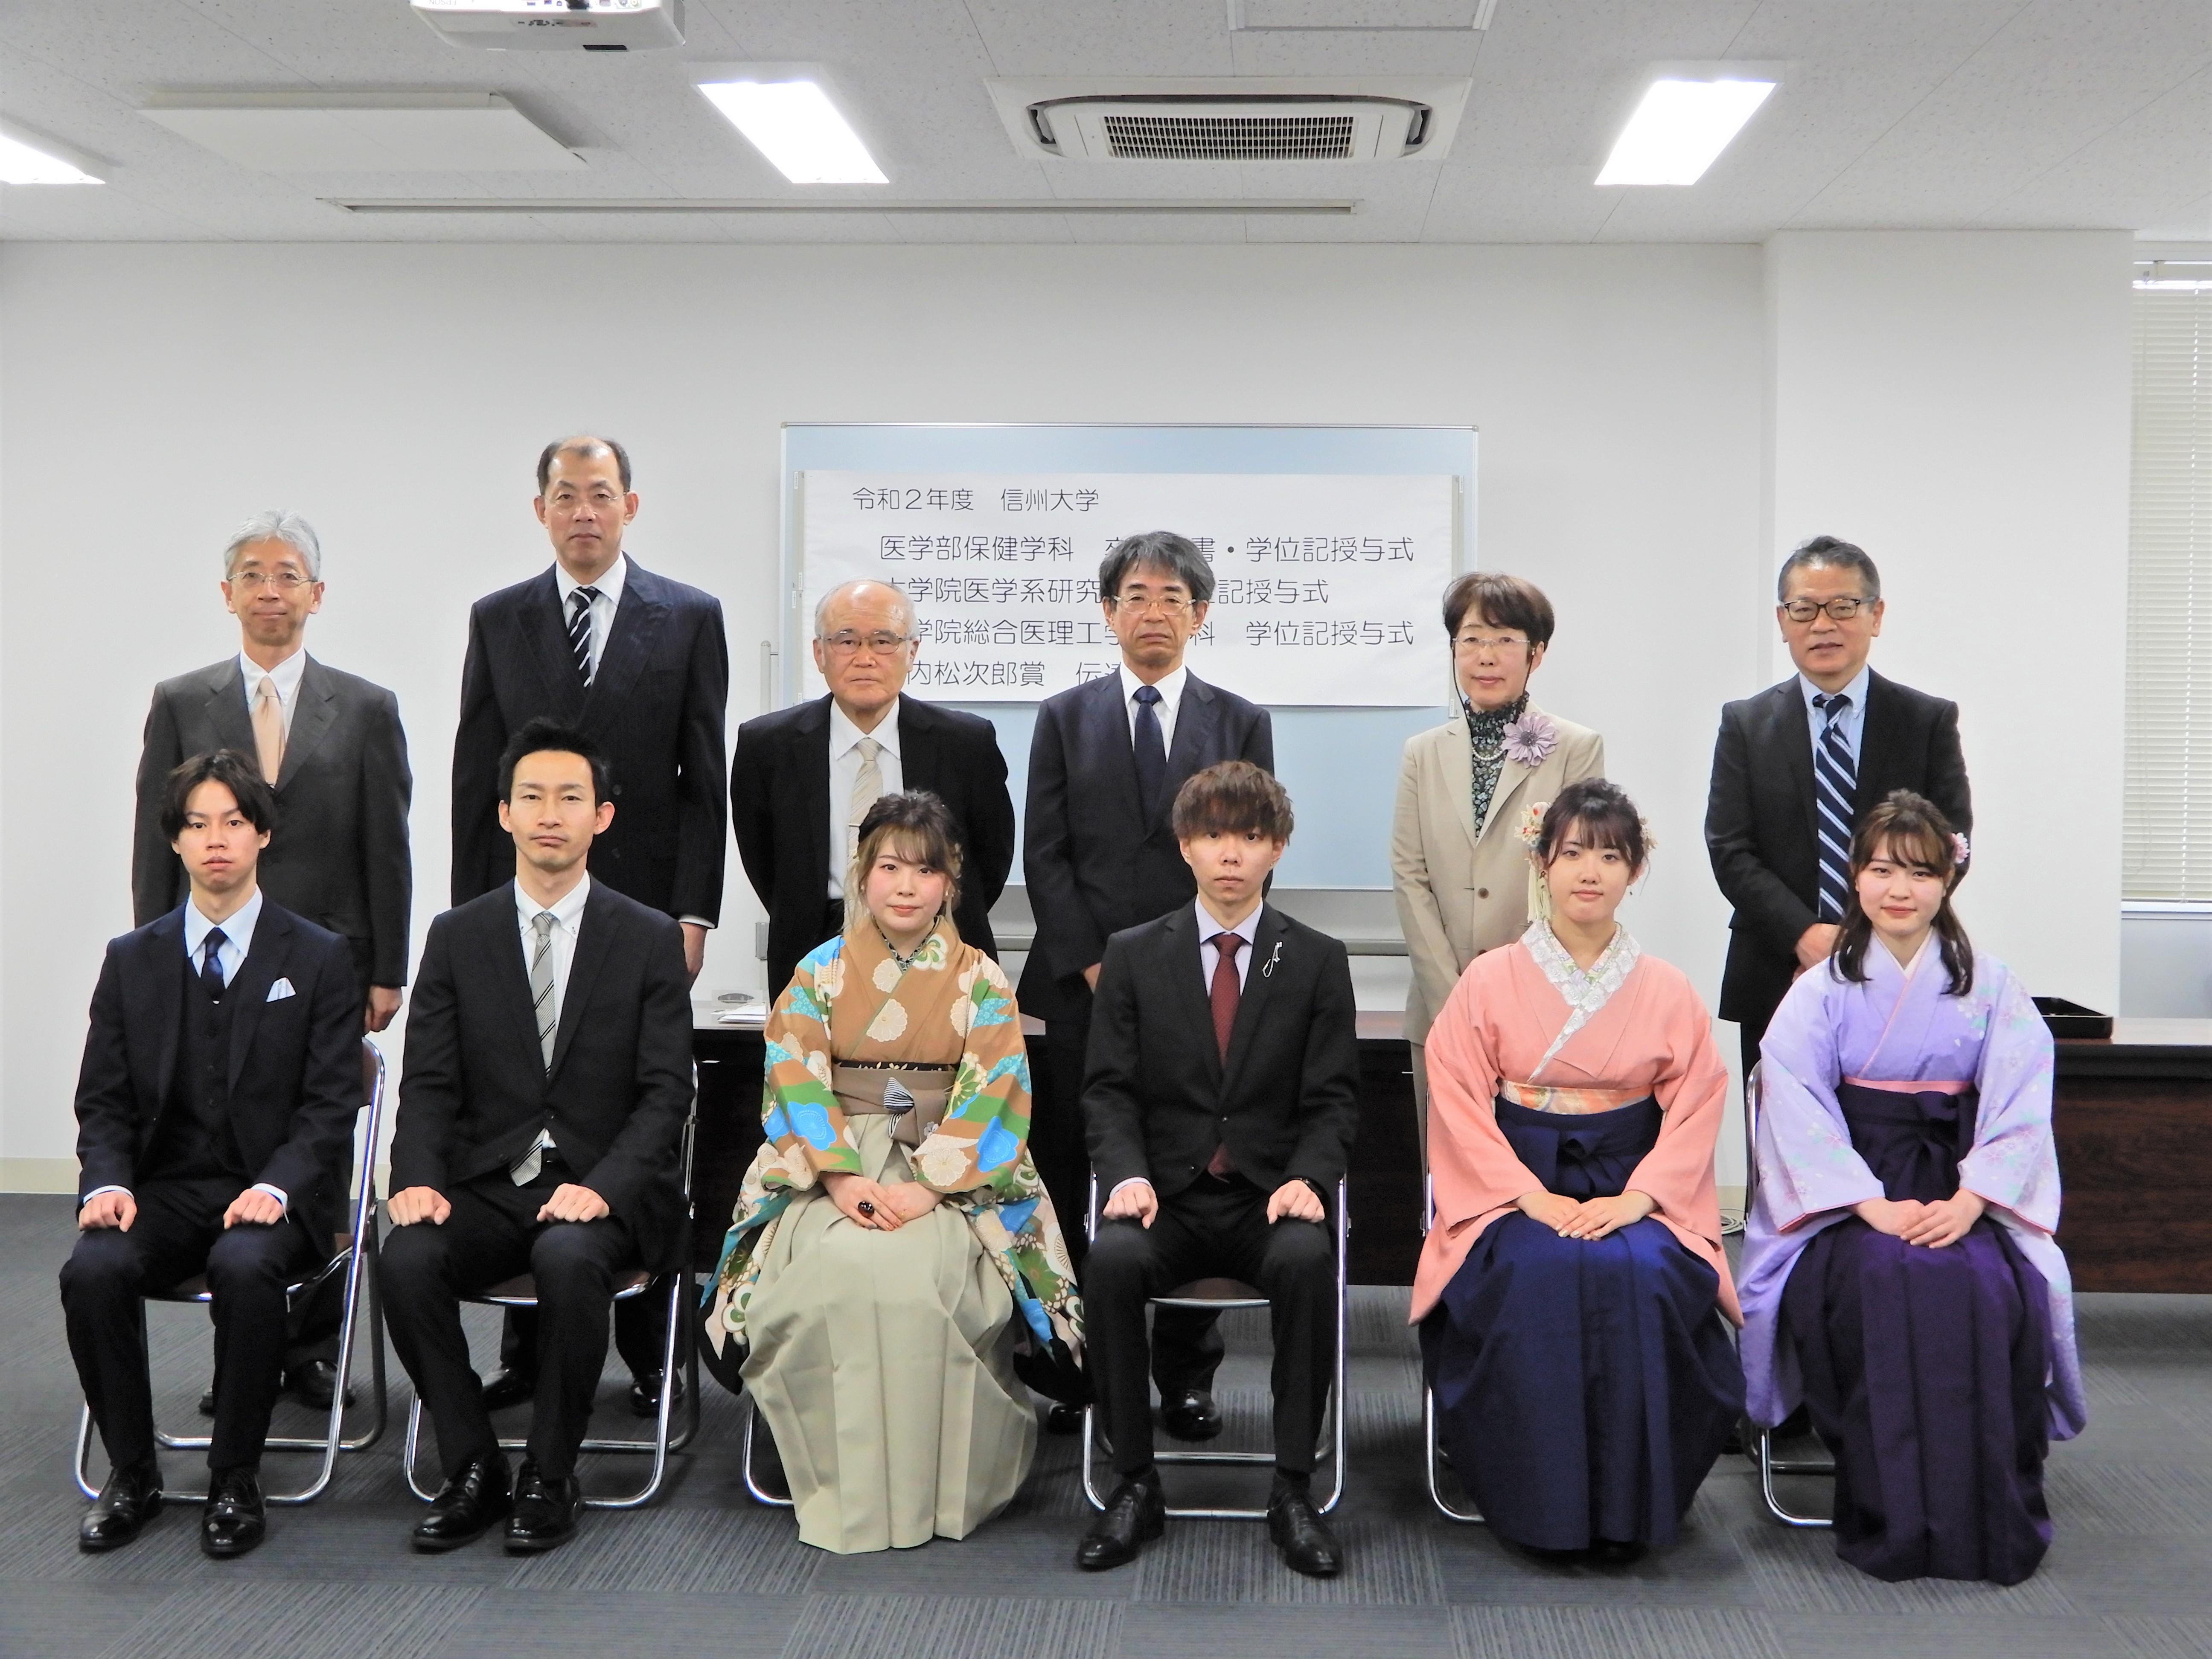 Graduation_ceremony_20210321